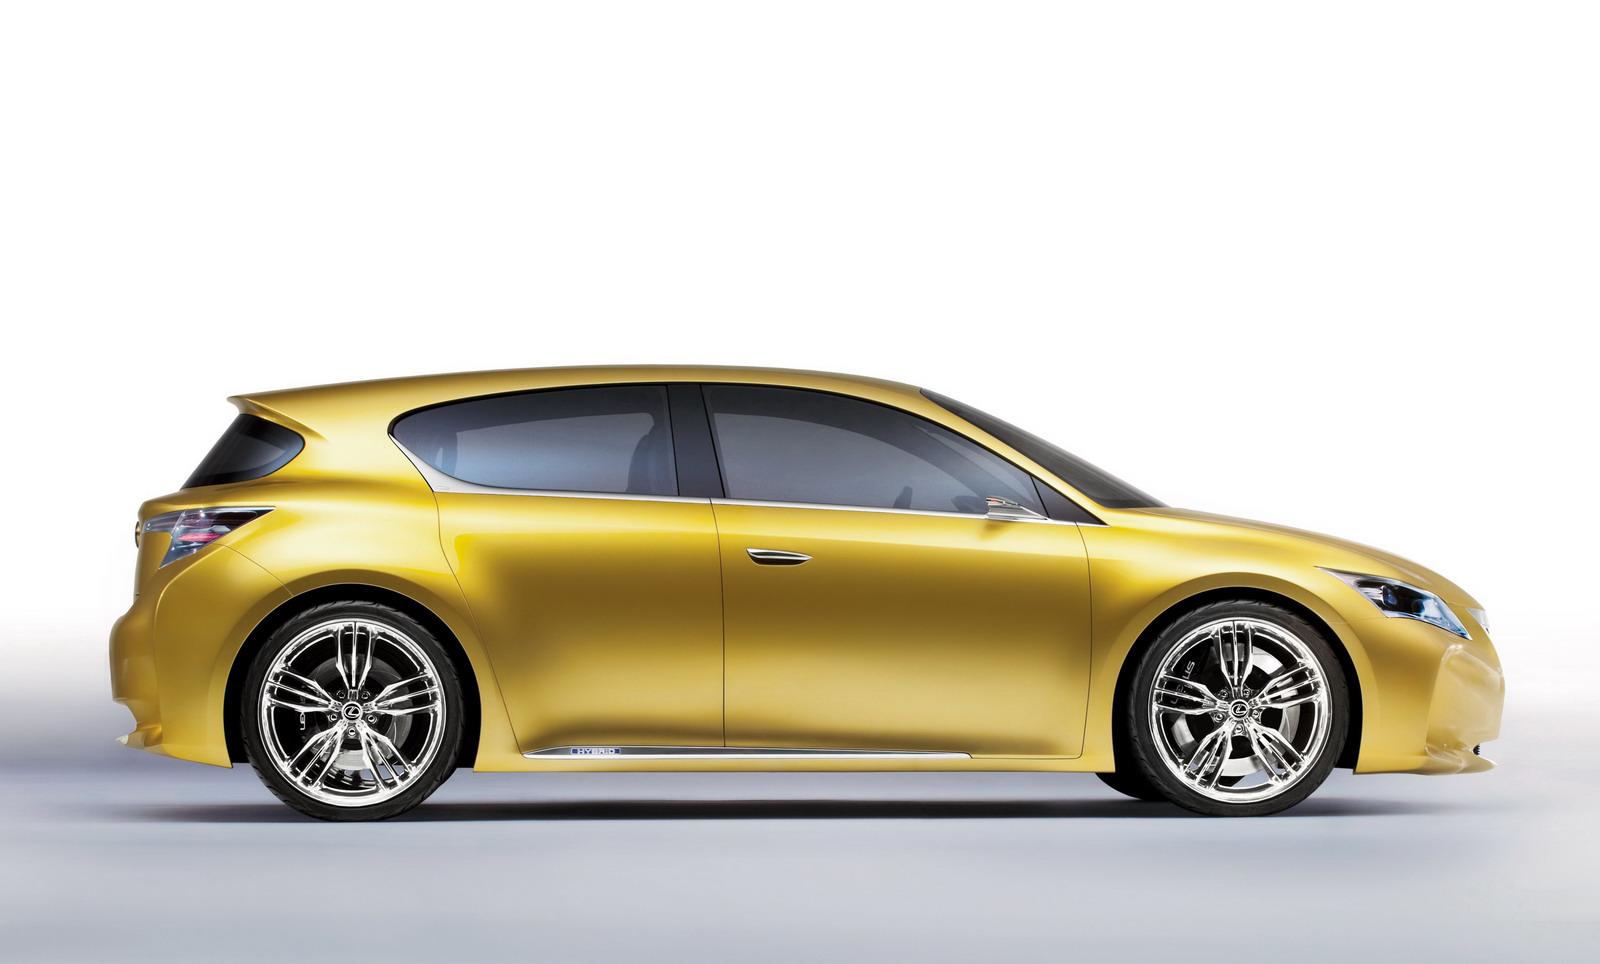 https://s1.cdn.autoevolution.com/images/news/lexus-lf-ch-hatchback-concept-unveiled-10749_1.jpg